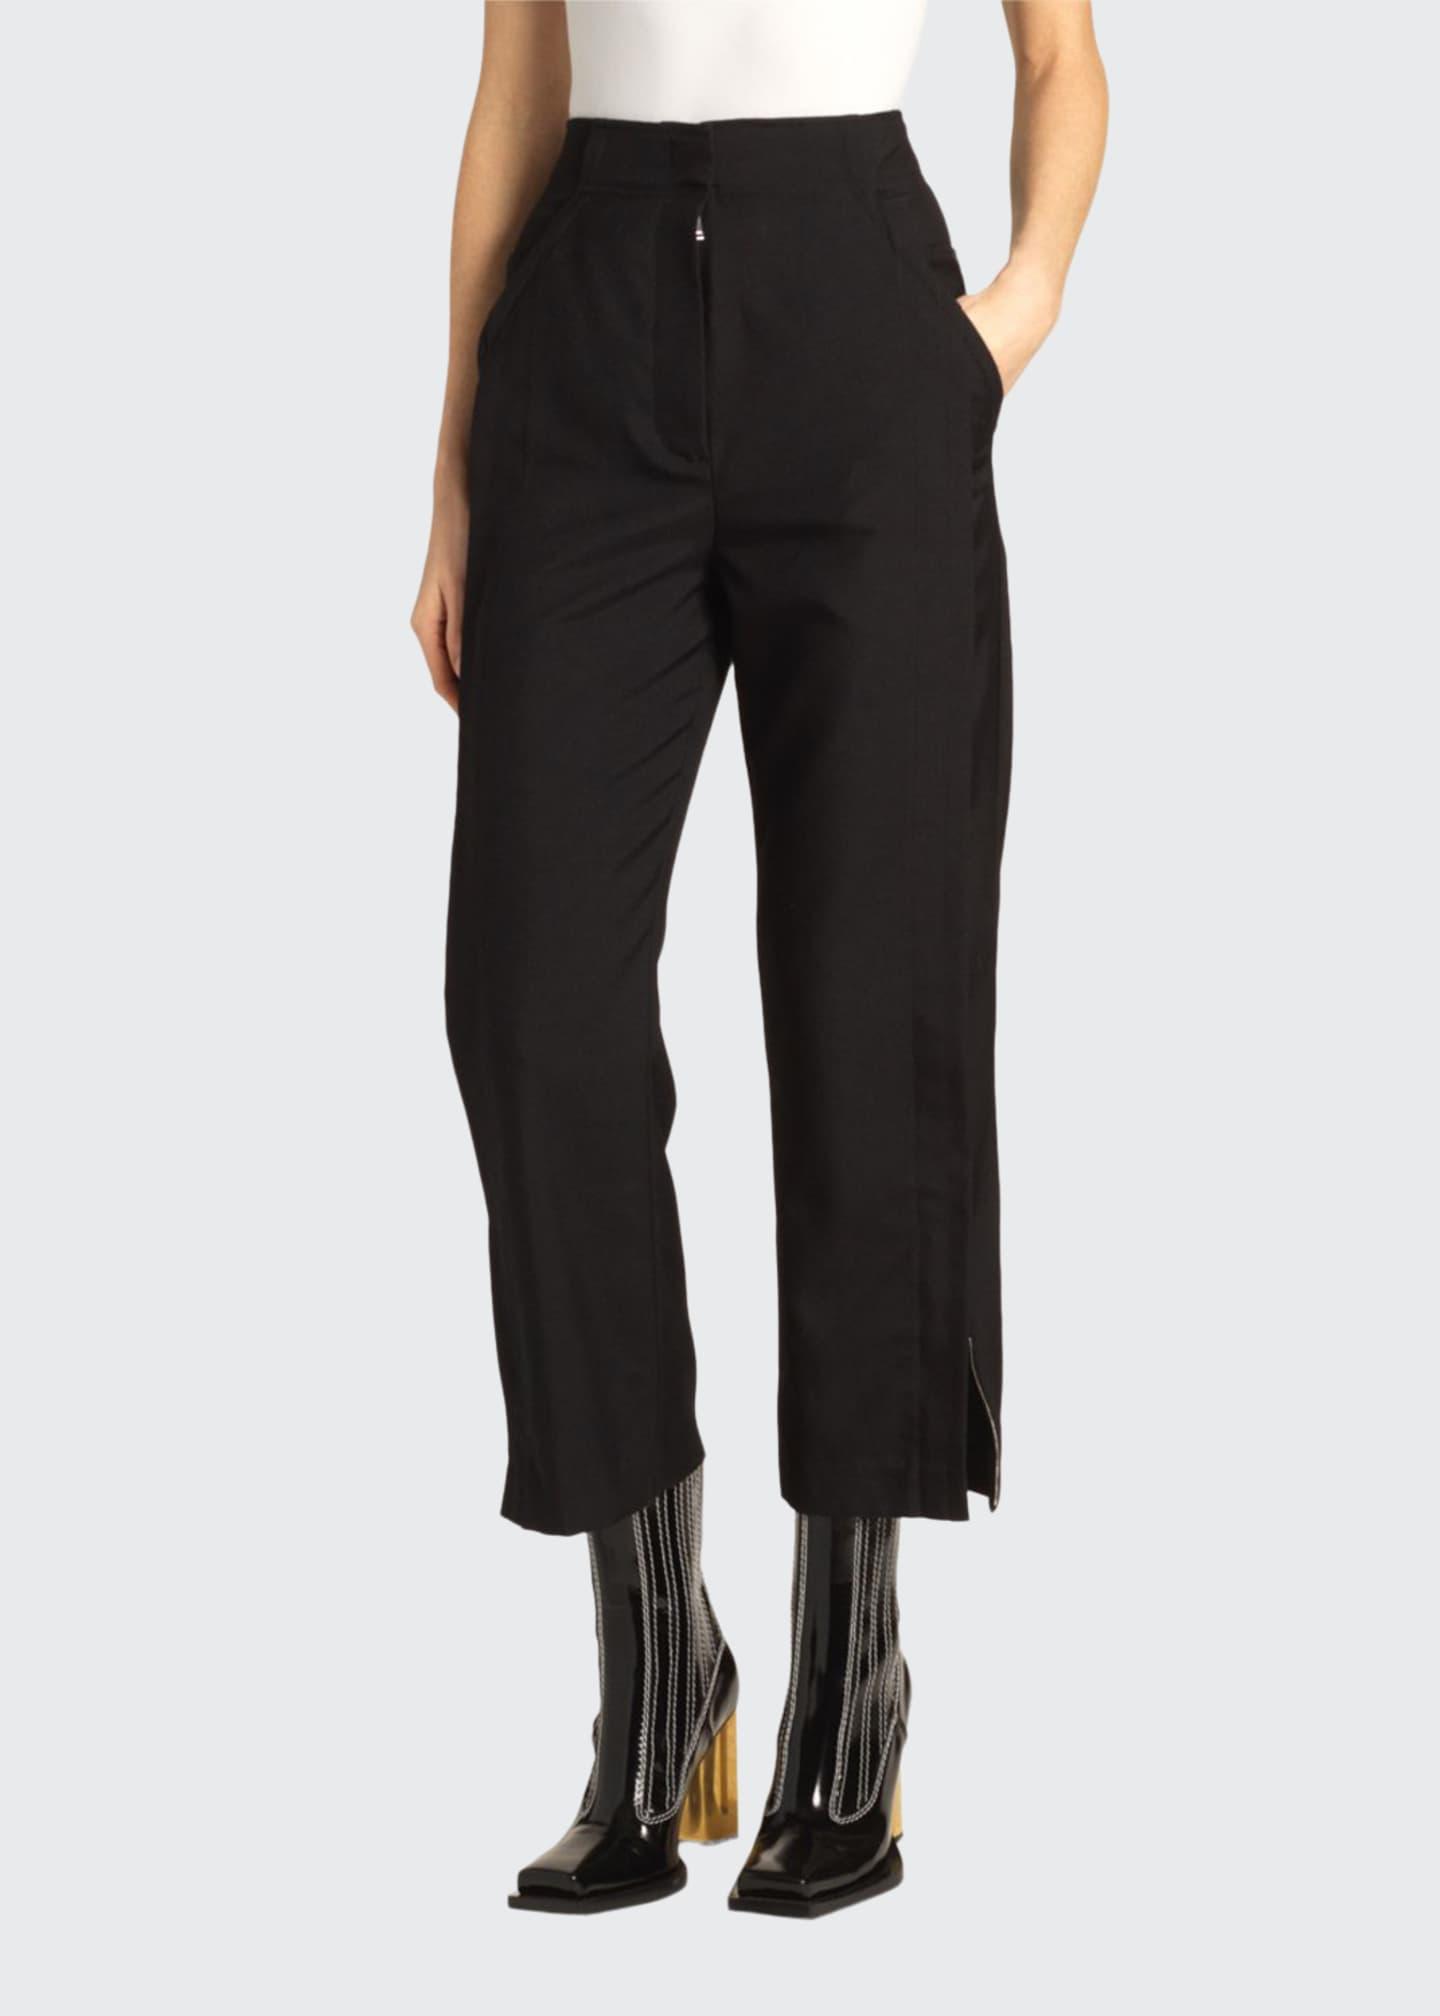 Proenza Schouler High-Rise Split-Hem Pants